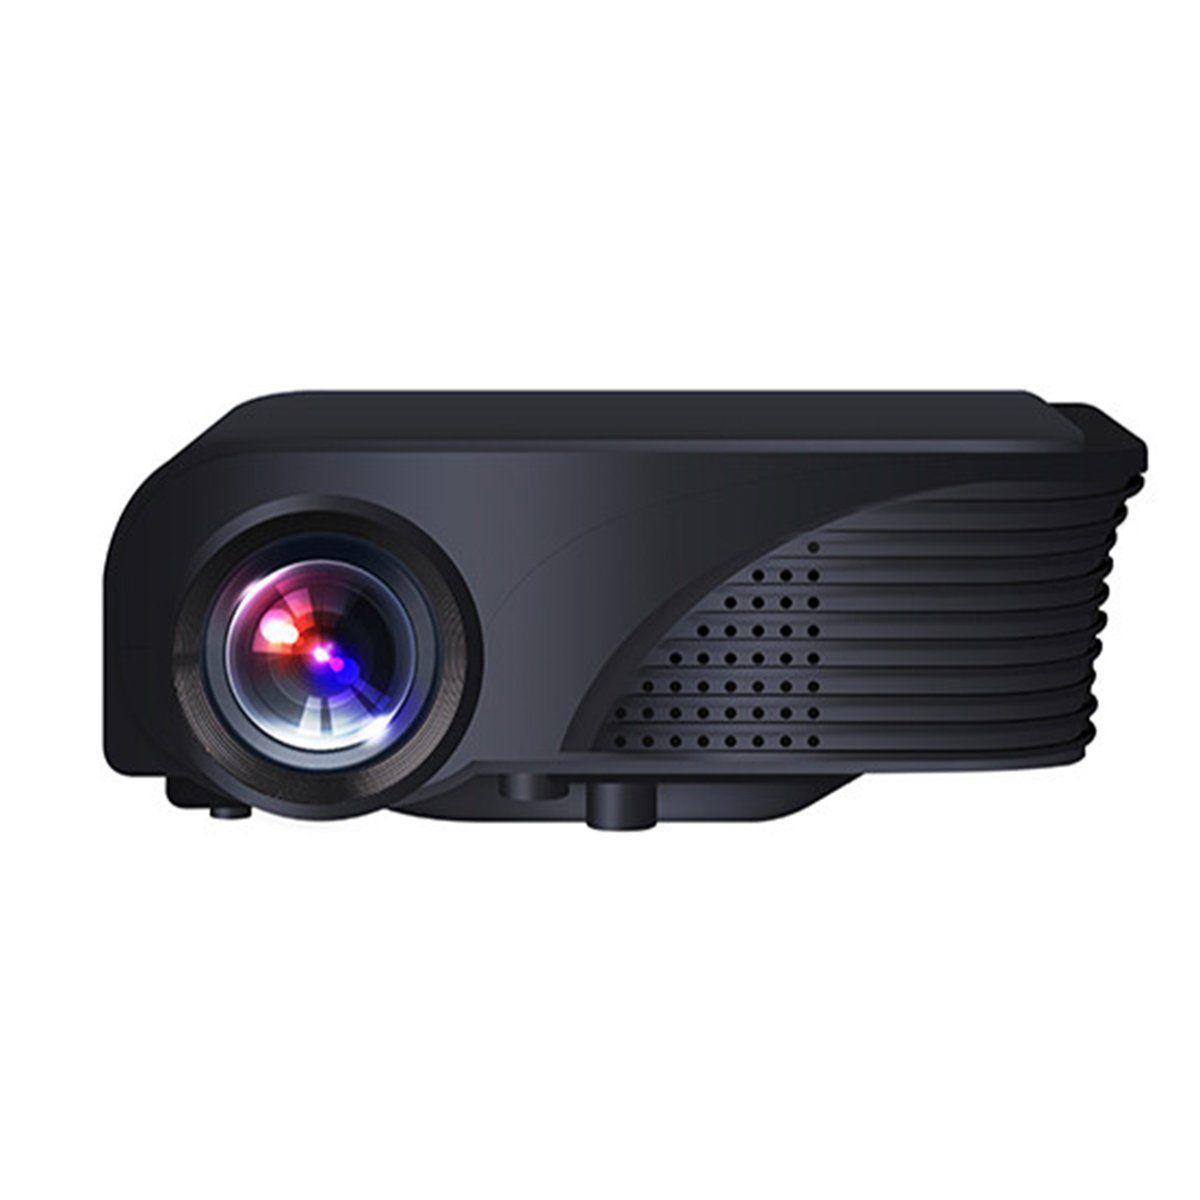 S320 portátil MINI 1800 Lúmenes HD 1080 P Proyector de Vídeo de Cine En Casa Mul